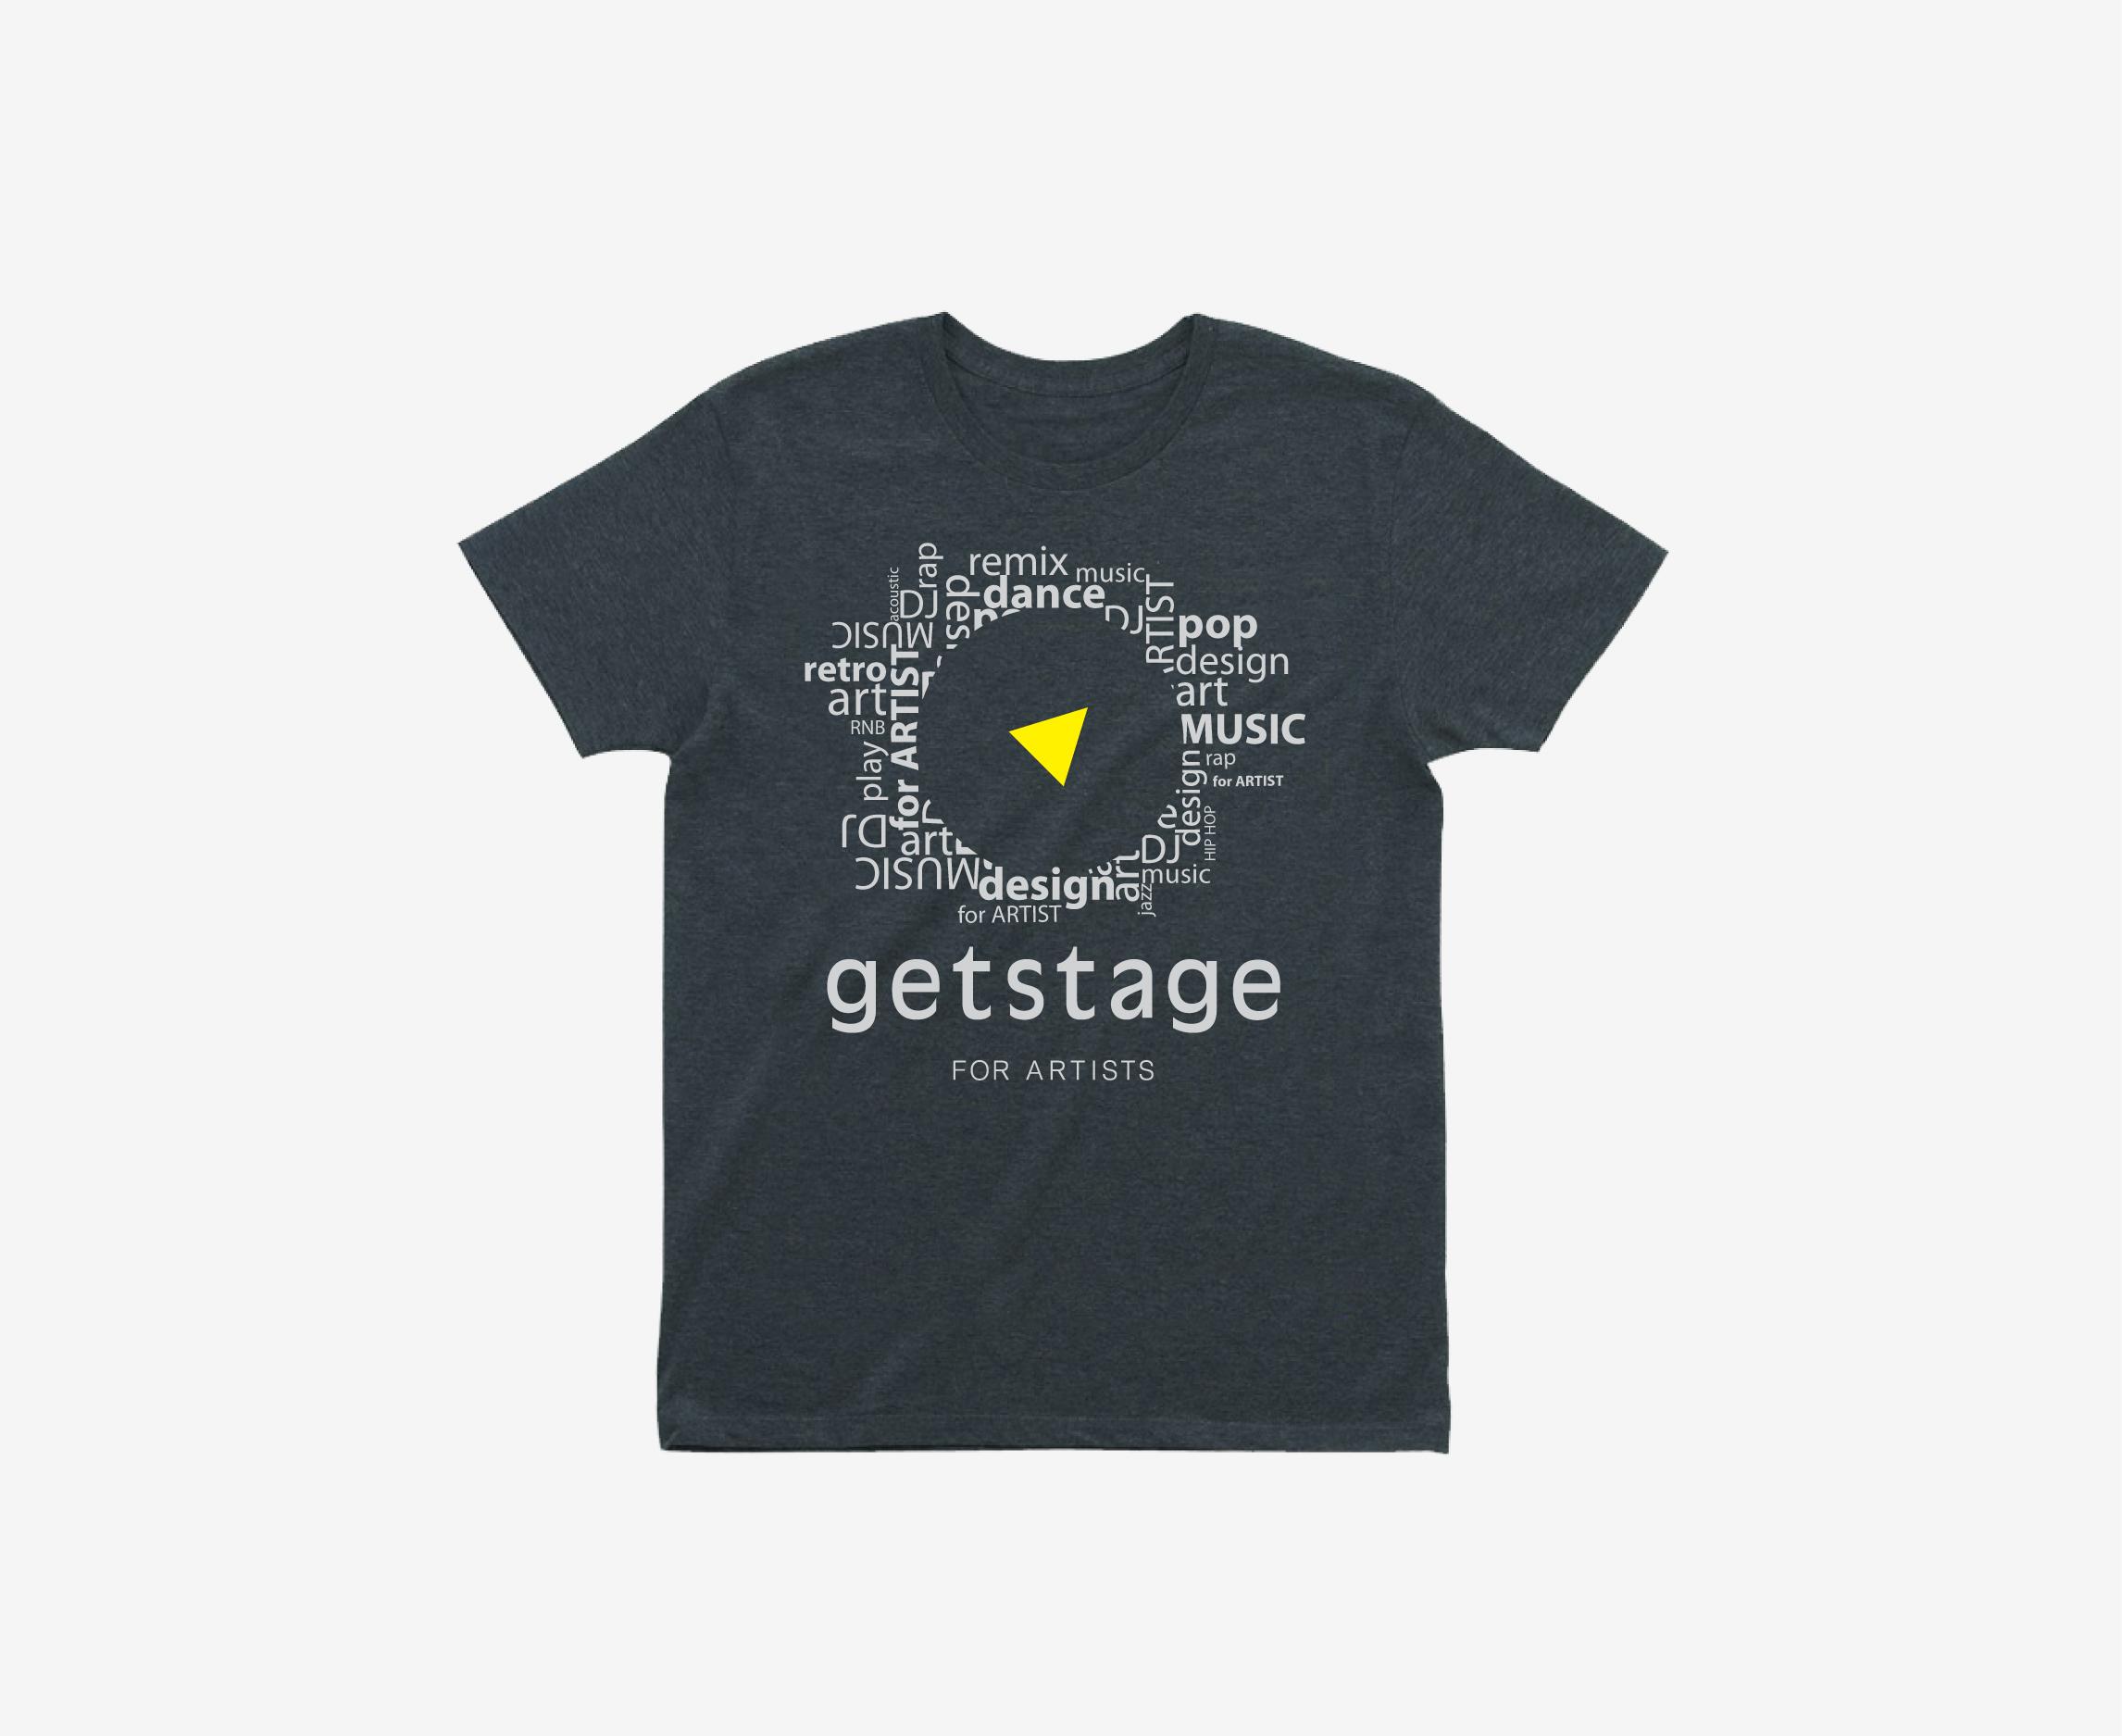 Getstage